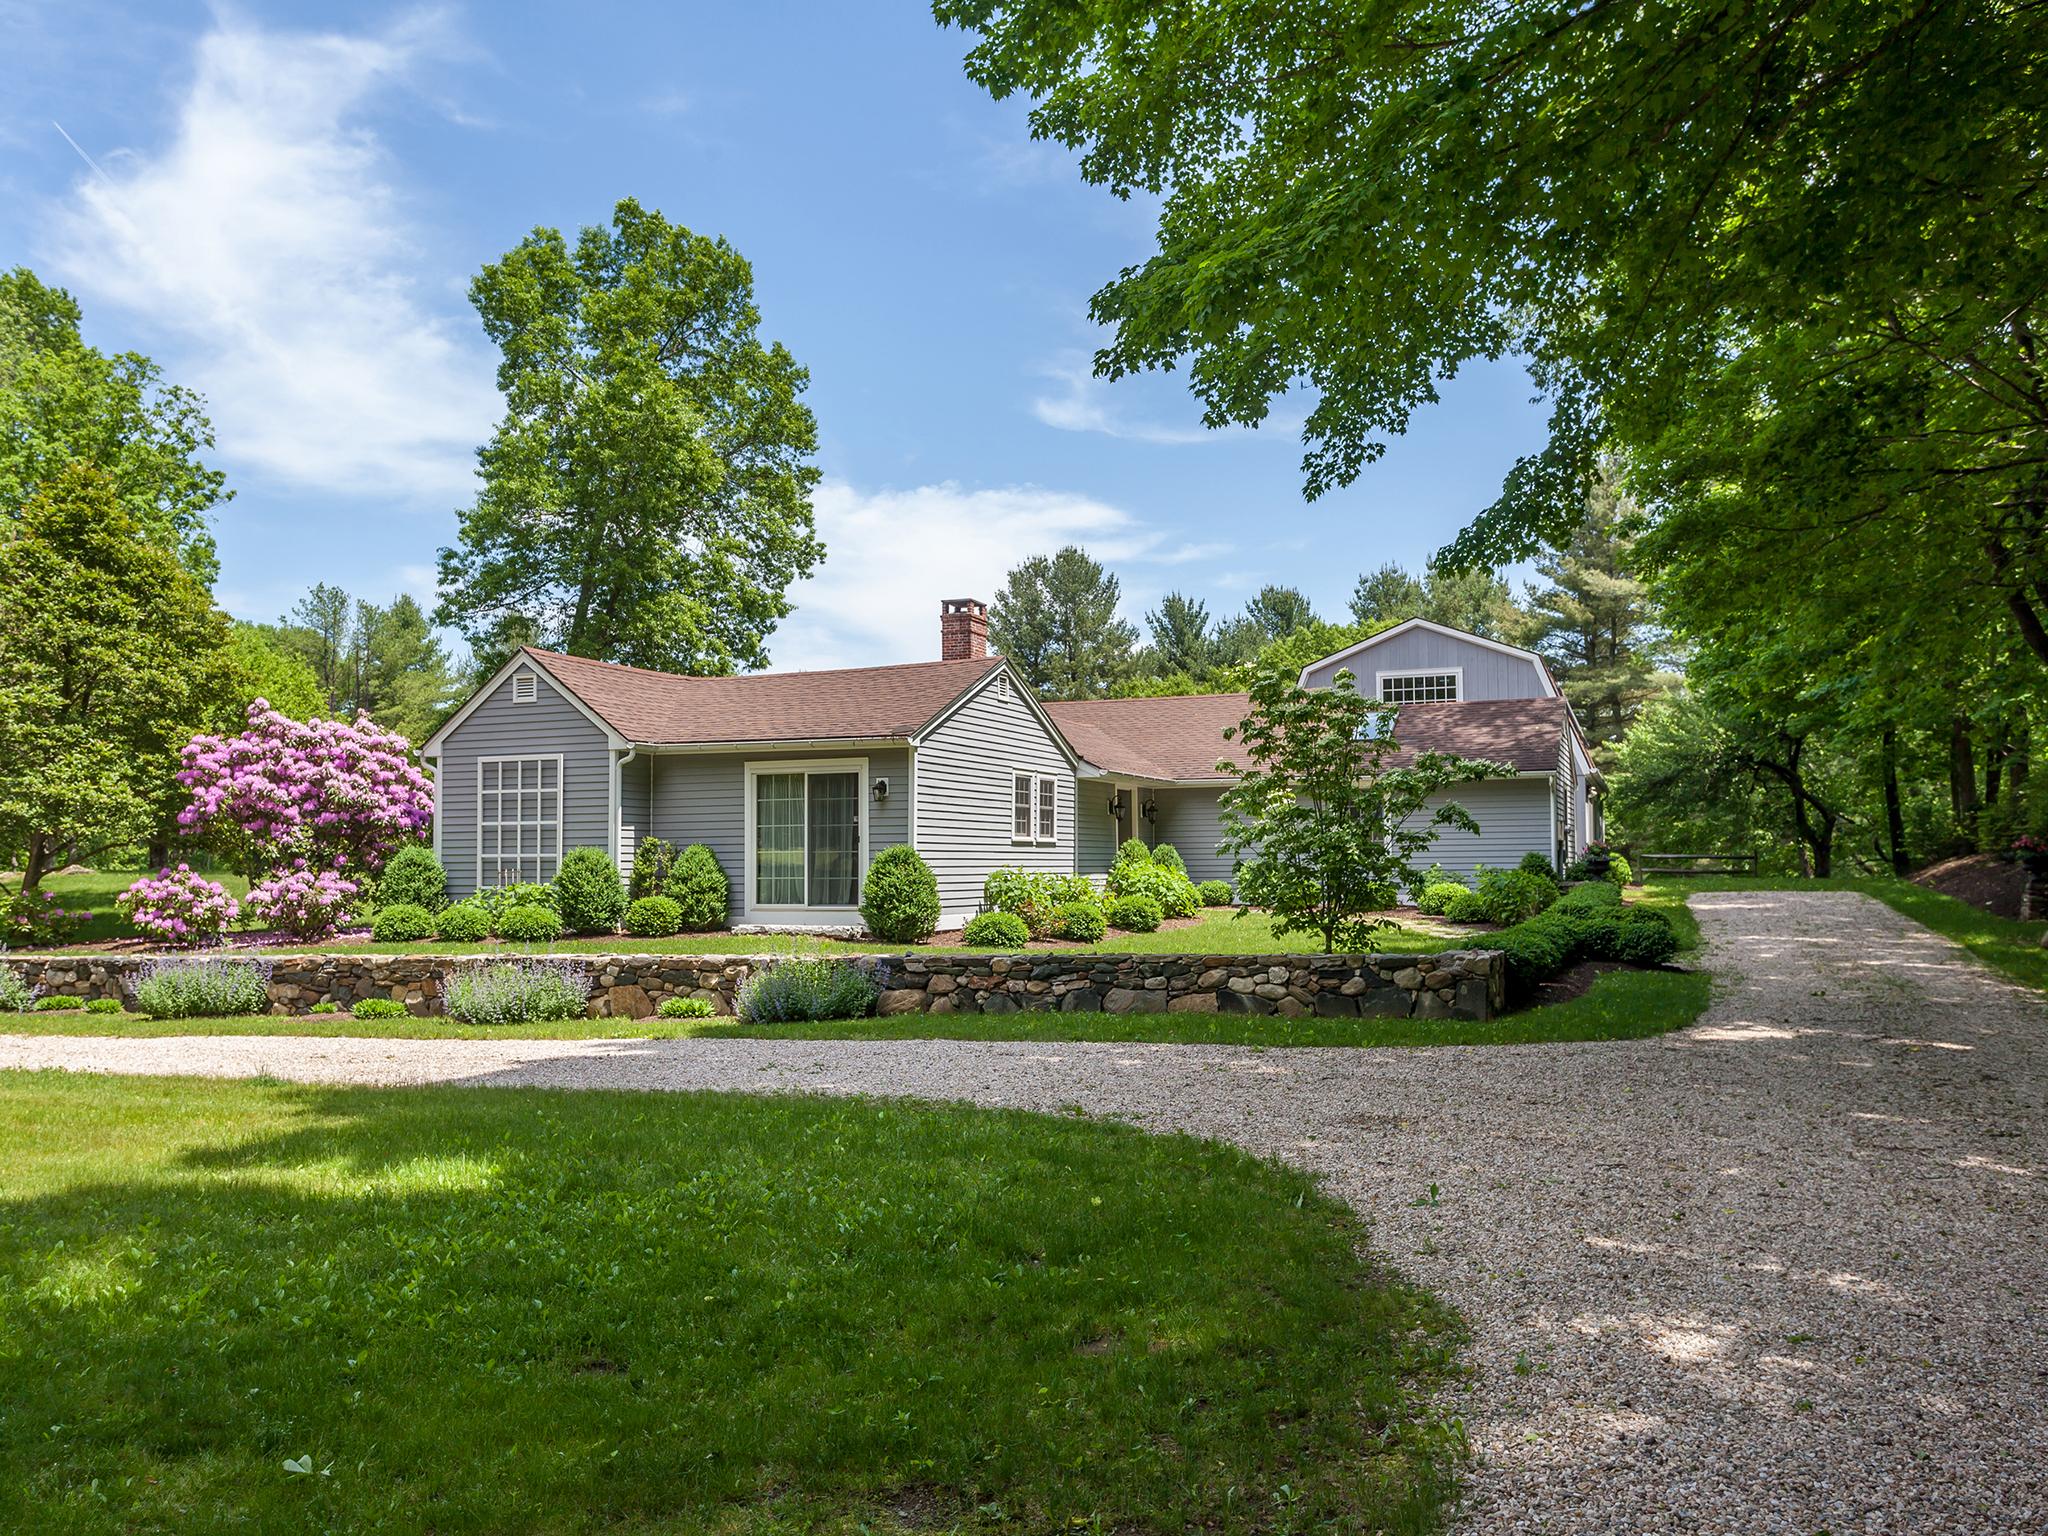 Casa Unifamiliar por un Venta en Prime Washington Location 132 Shearer Rd Washington, Connecticut, 06793 Estados Unidos